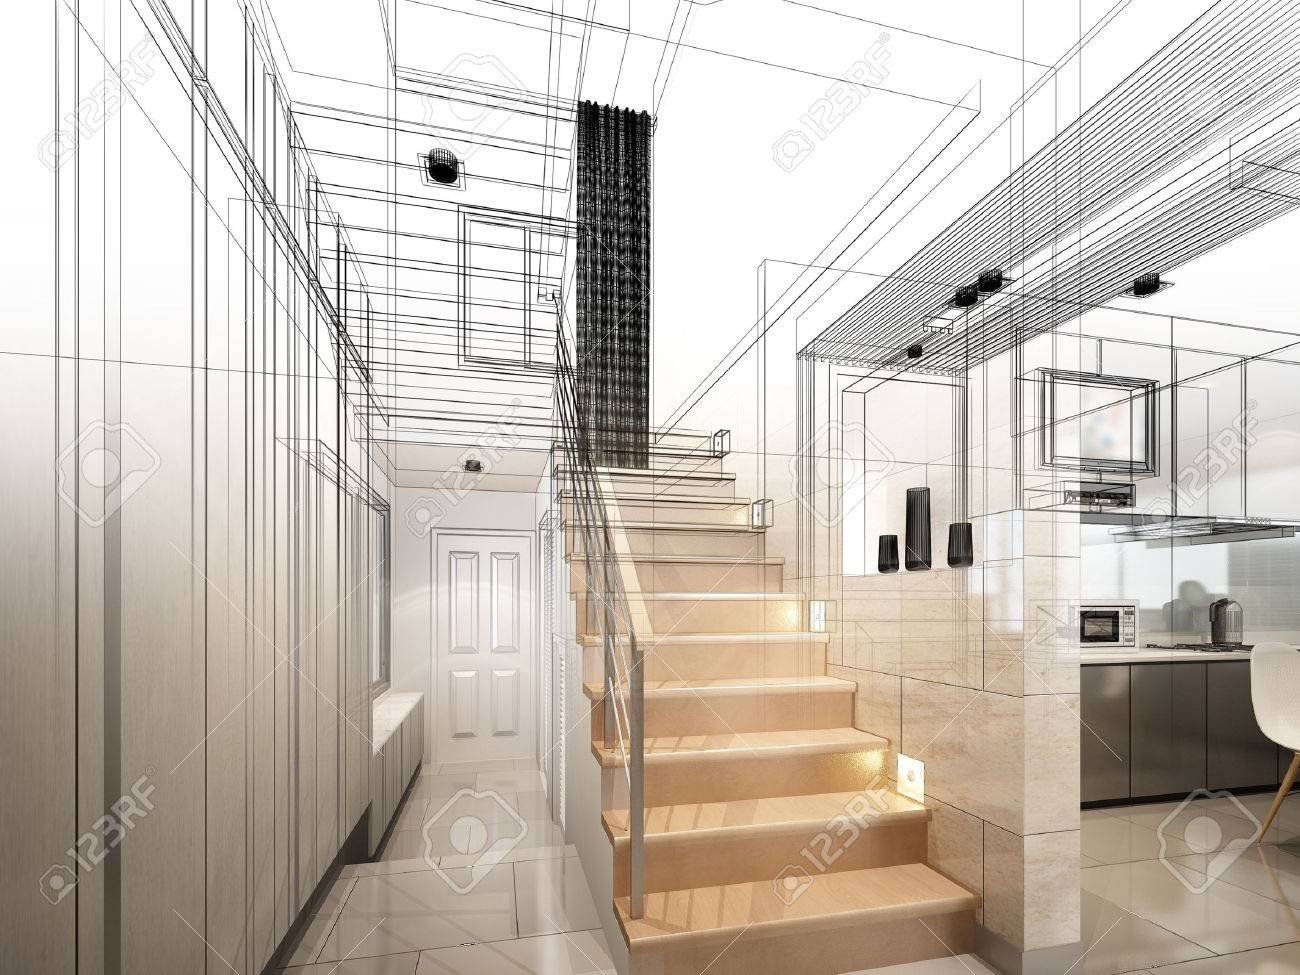 sketch design of stair hall 3dwire frame render - 40904844